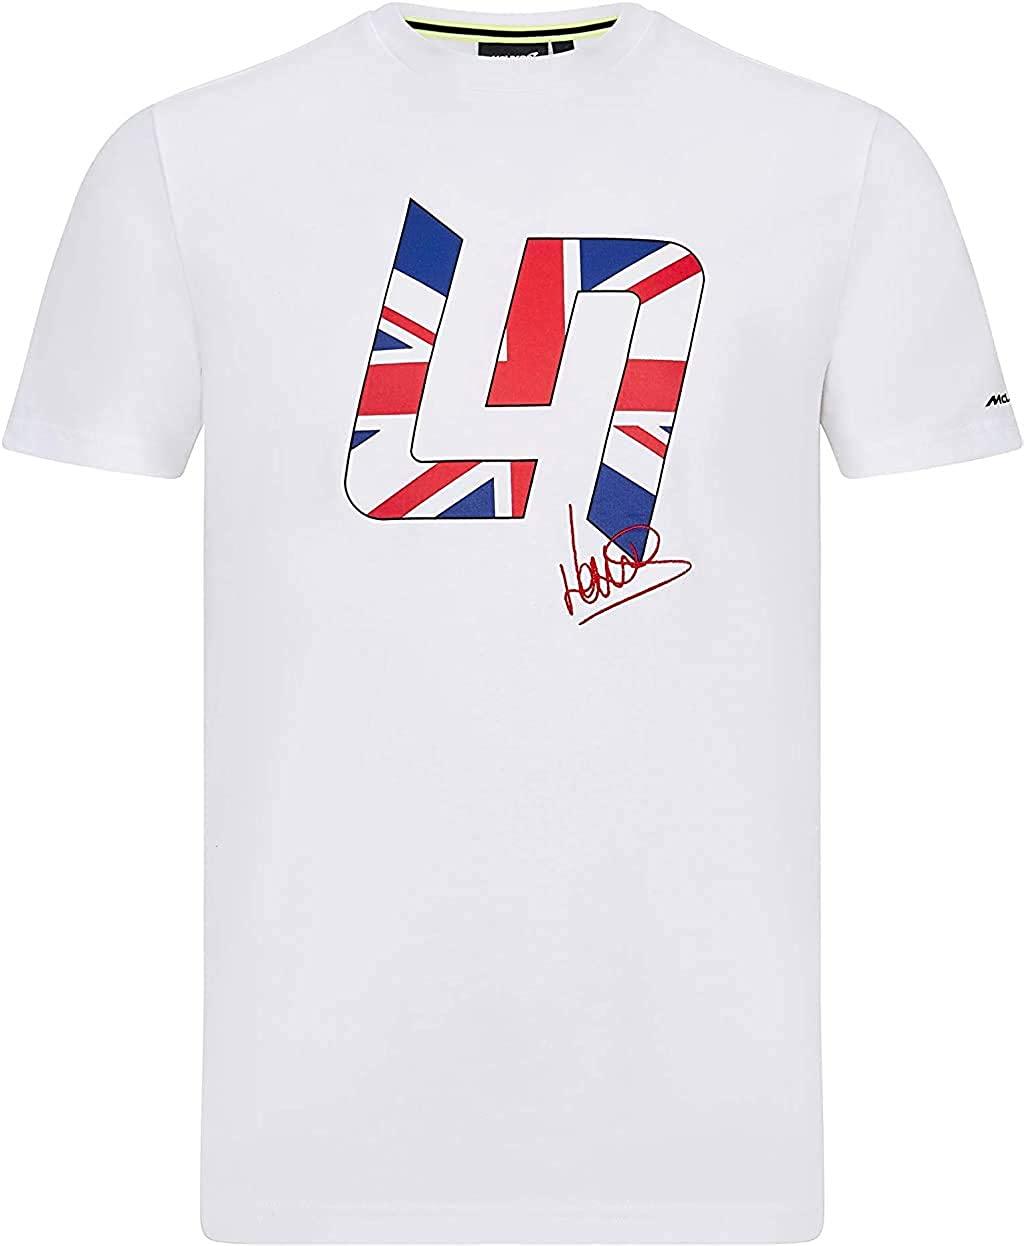 F1 McLaren Lando Norris Men's Great Britain T-Shirt White